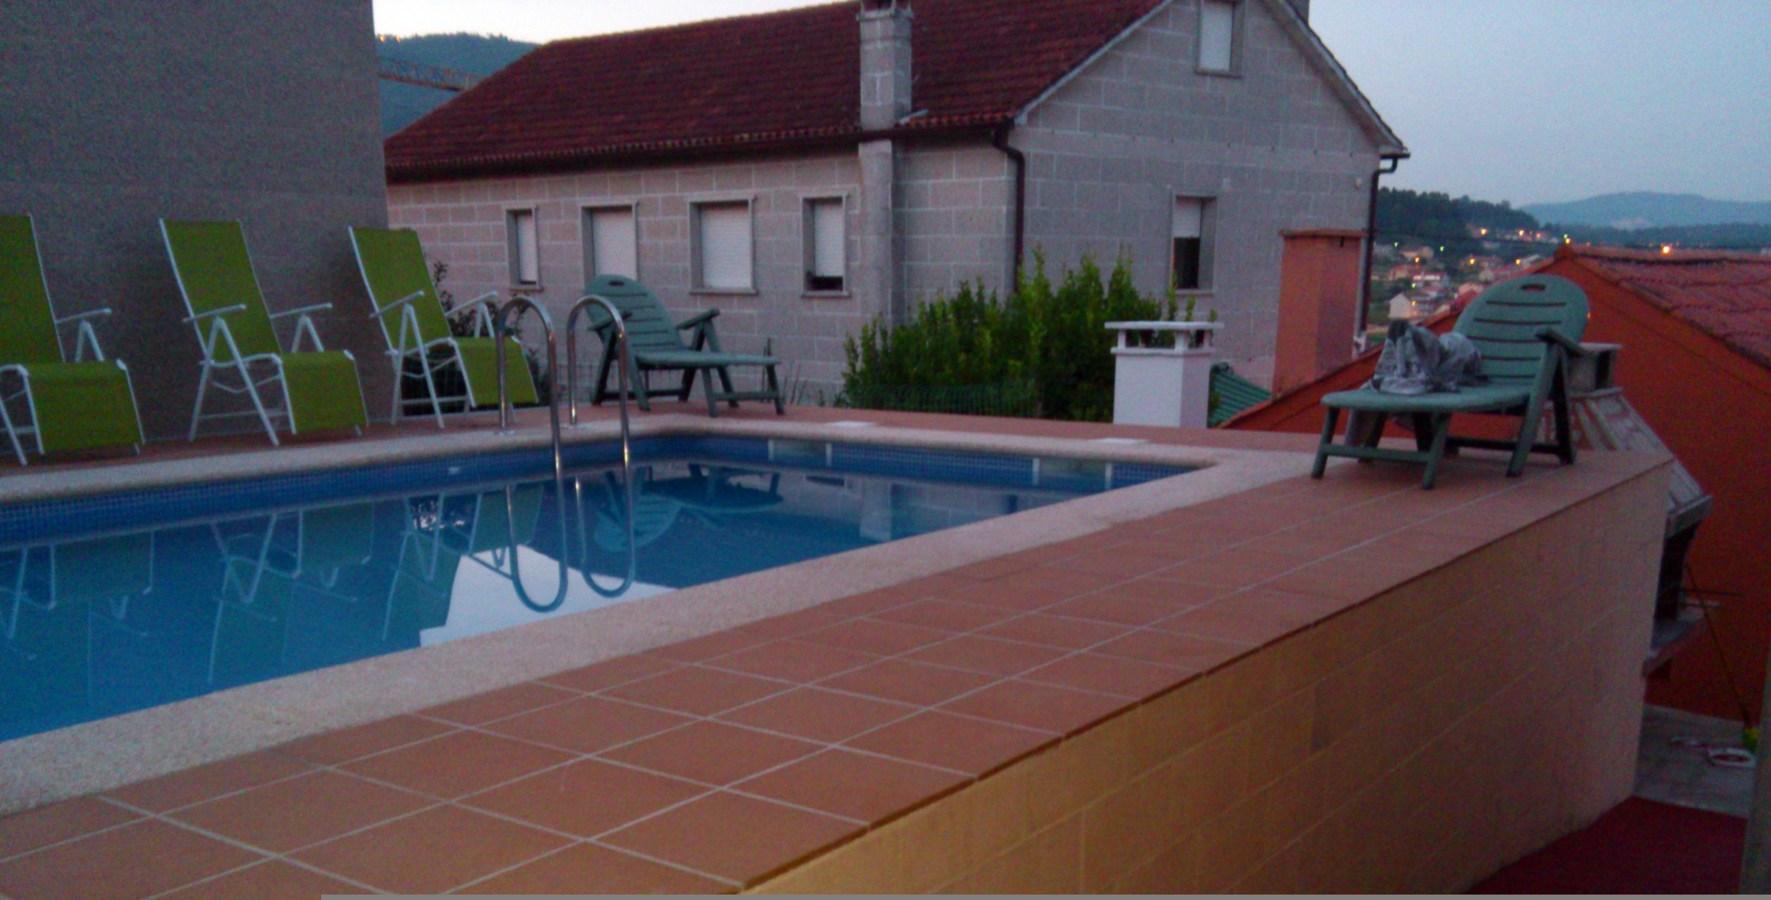 Foto piscina 7x3 m de piscinas fraiz 387457 habitissimo for Empresas que construyen piscinas